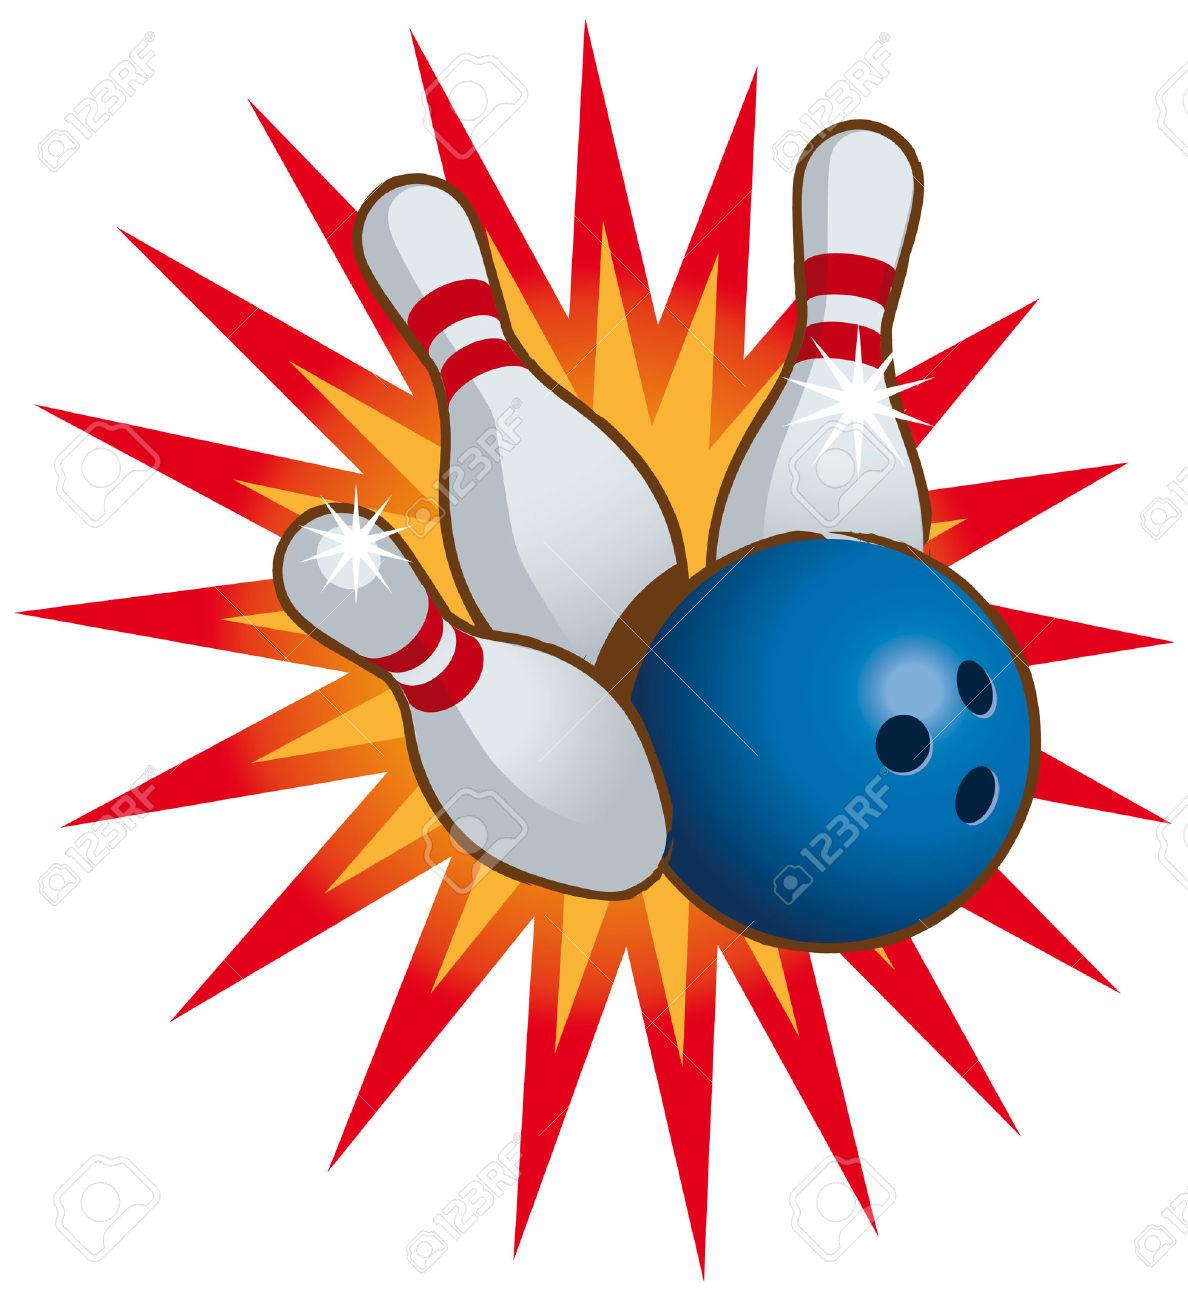 326 Bowling Pins free clipart.